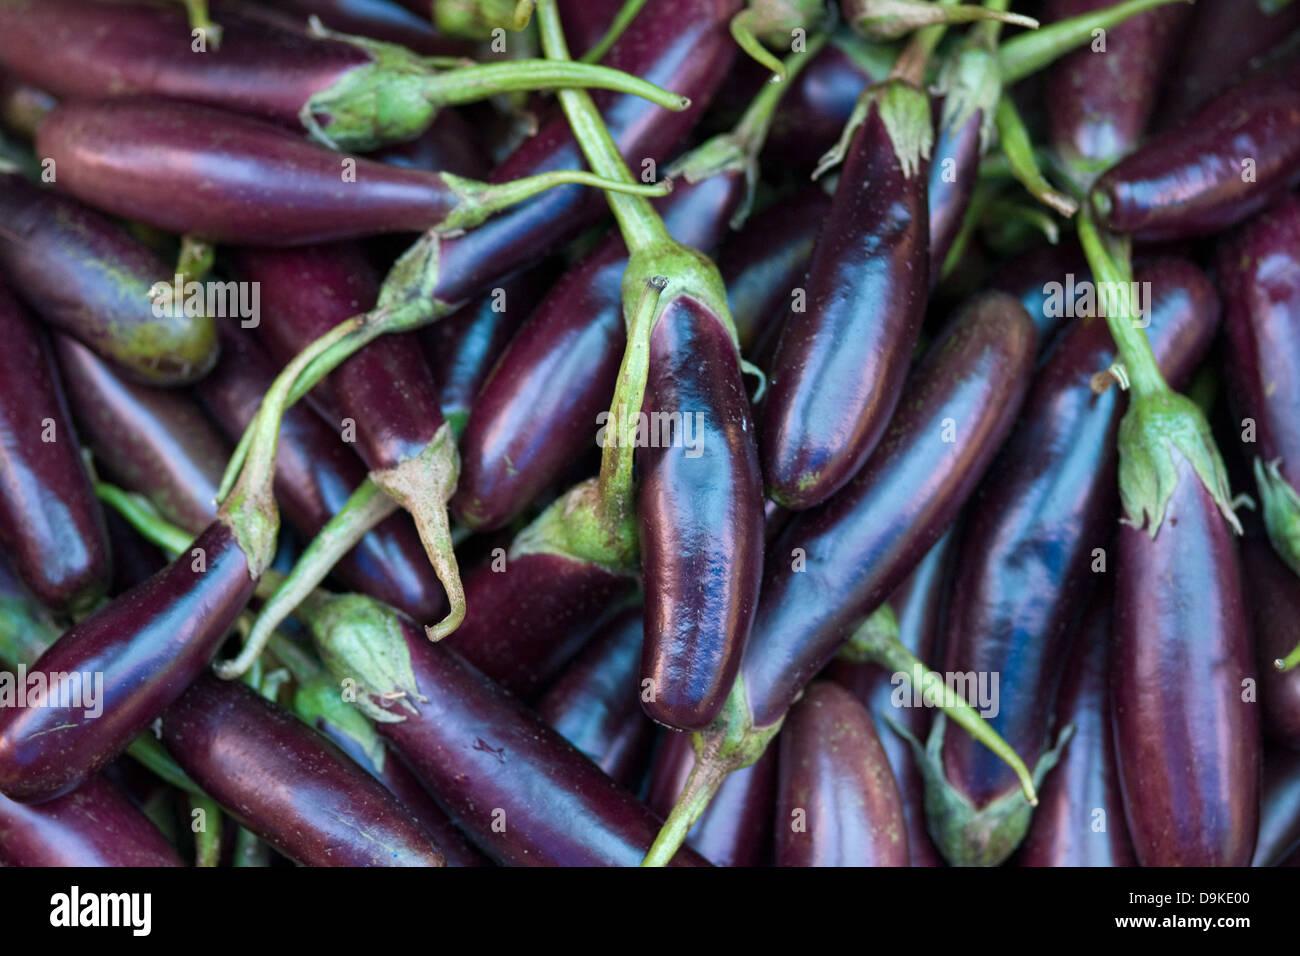 asia india karnataka madikeri eggplant on the market stock photo royalty free image. Black Bedroom Furniture Sets. Home Design Ideas